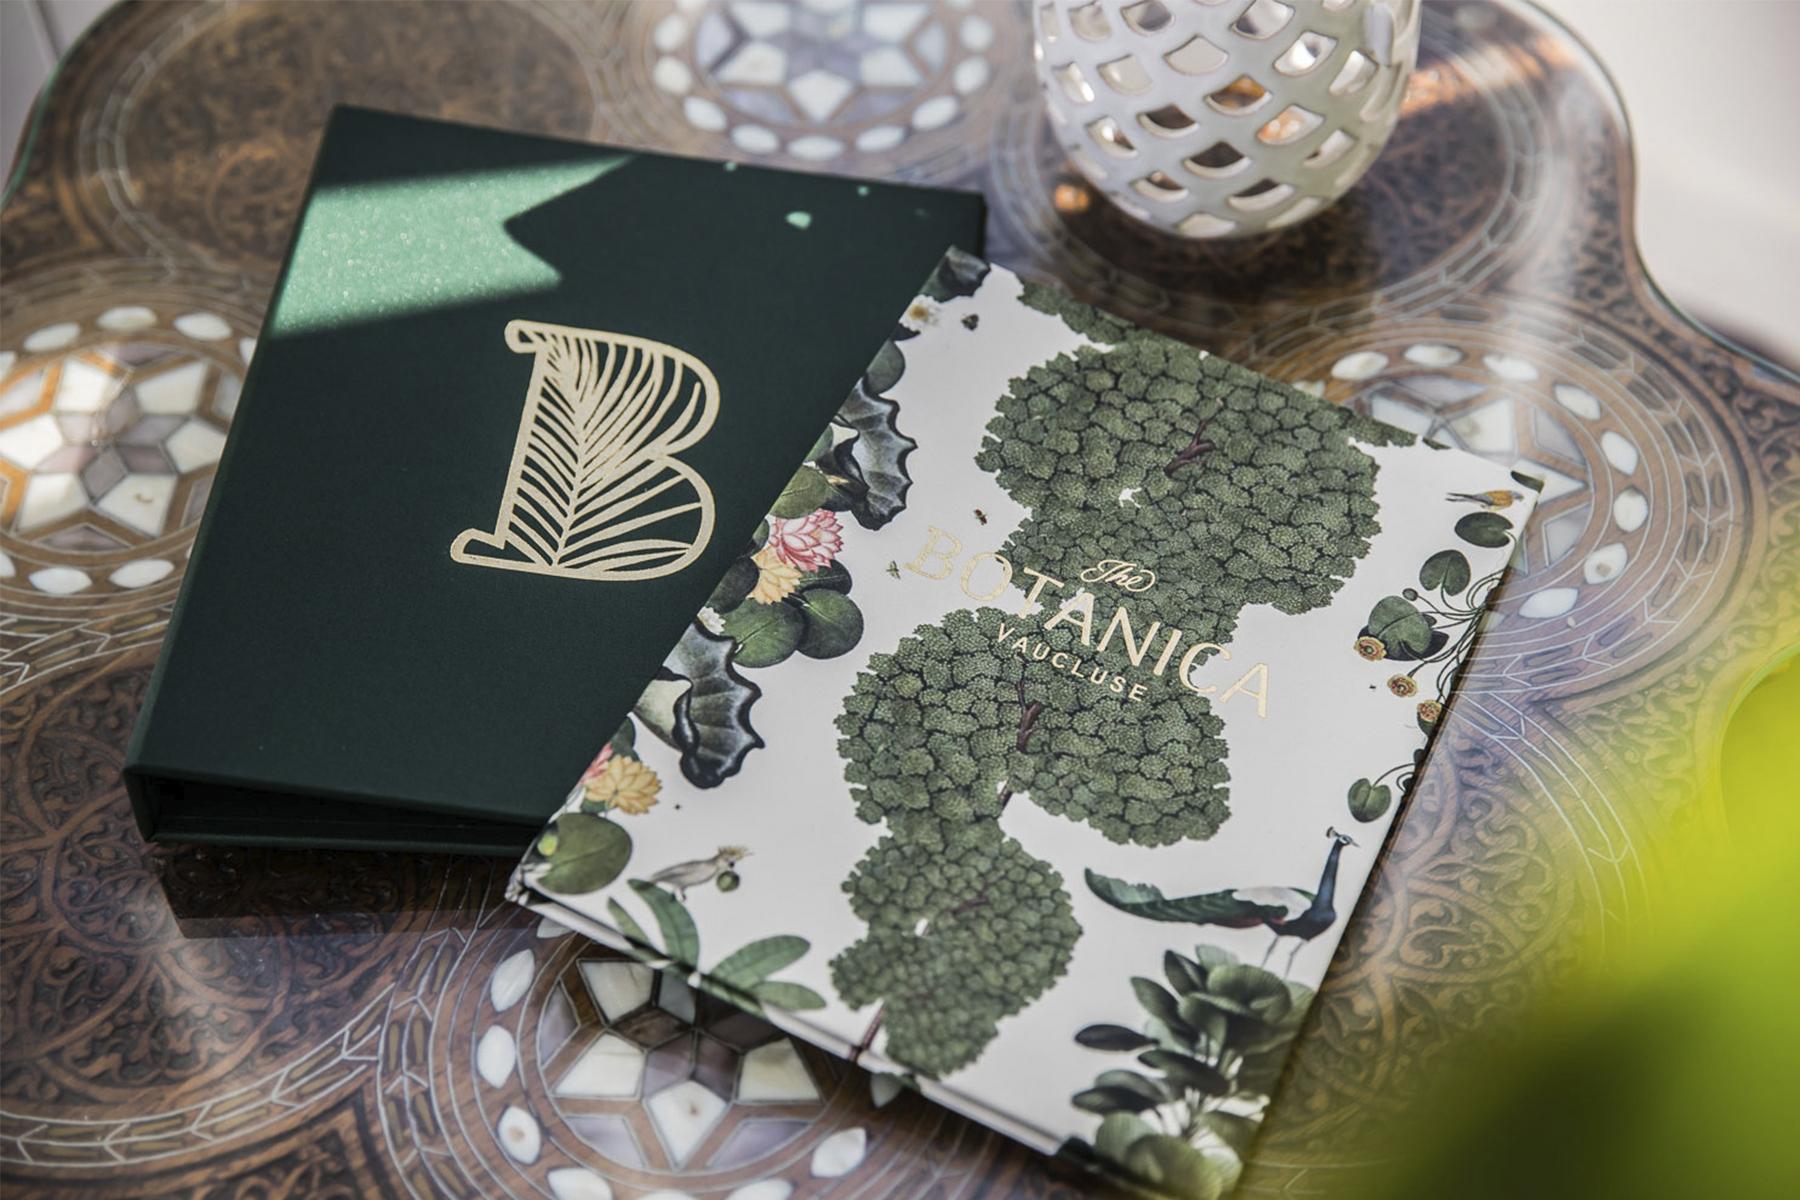 © Adam Robinson Design Botanica Vaucluse 01.jpg